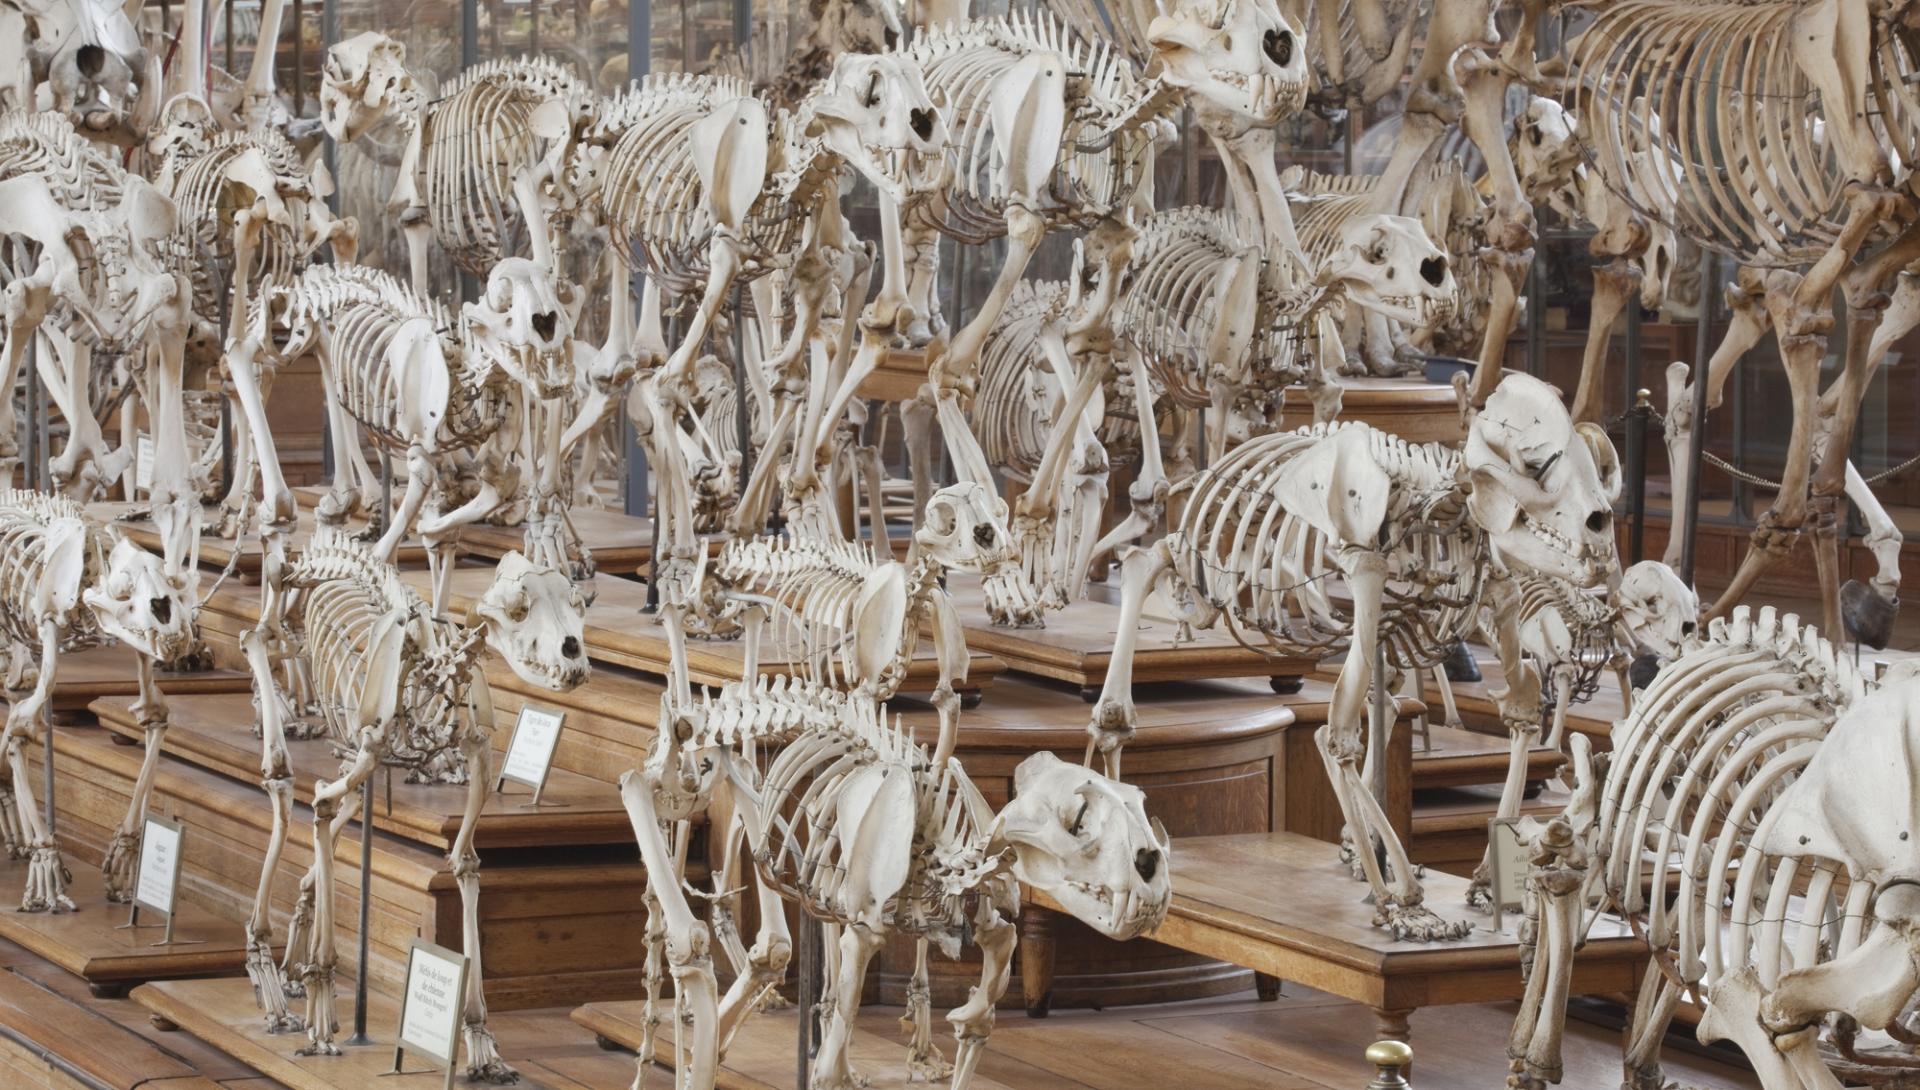 Galerie d'Anatomie comparée © MNHN - Bernard Faye